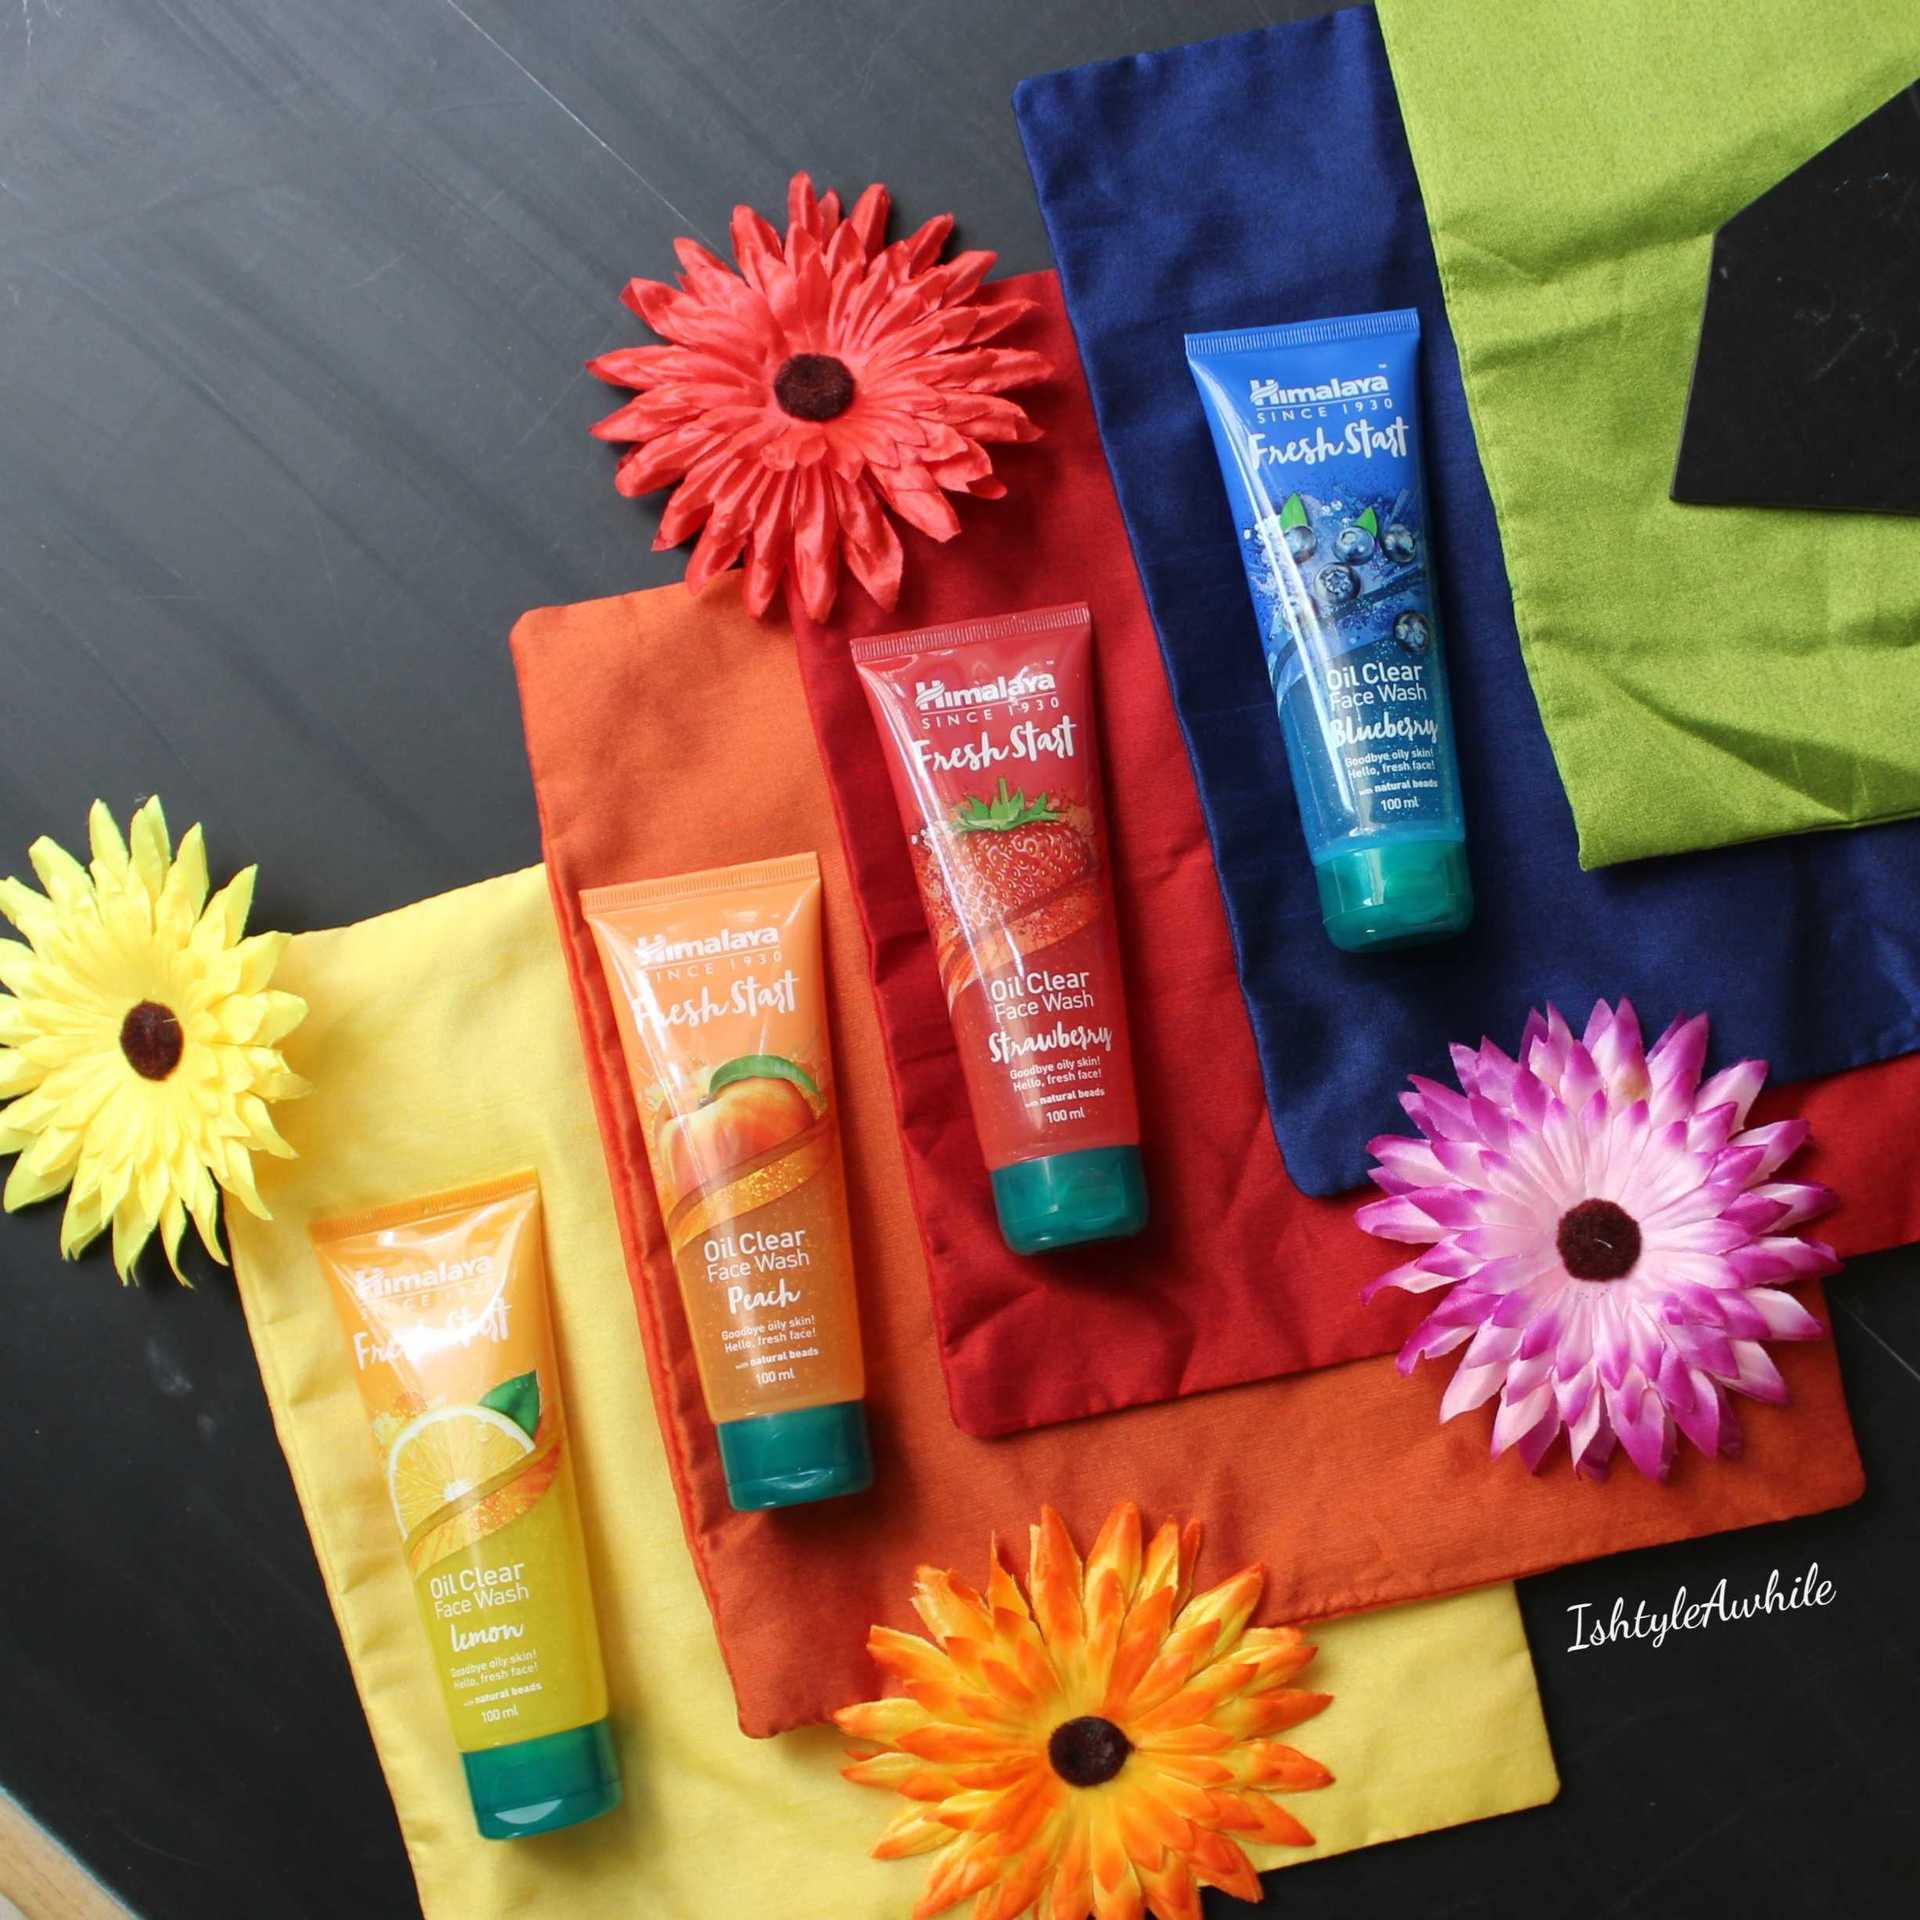 IshtyleAwhile - Himalaya Fresh_Start Facial wash review online